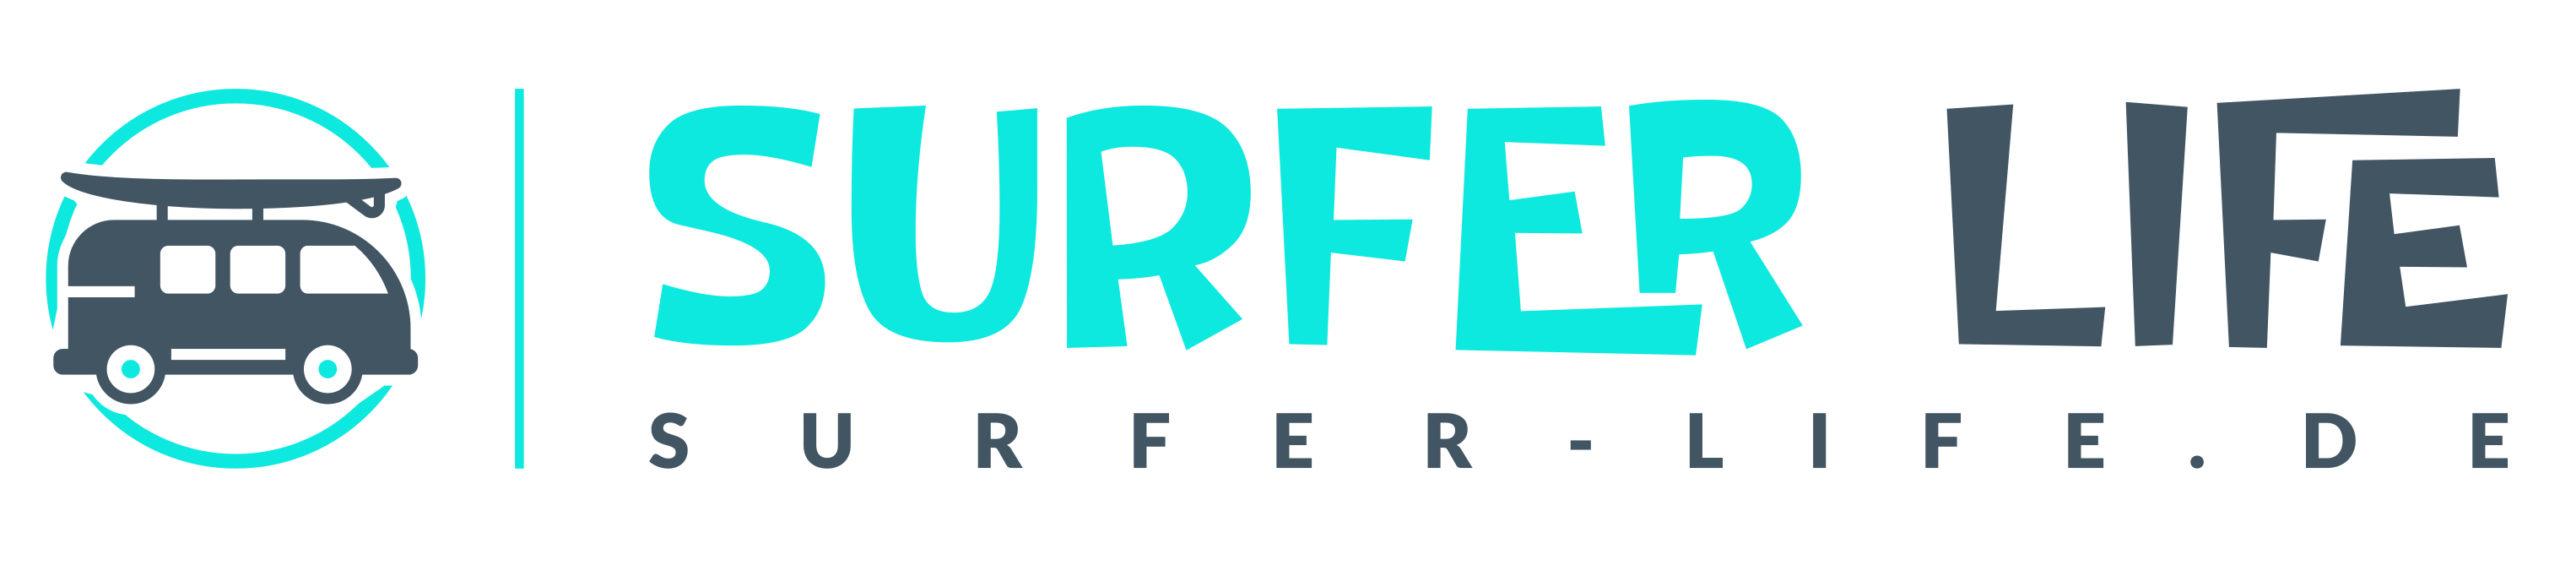 surfer-life.de